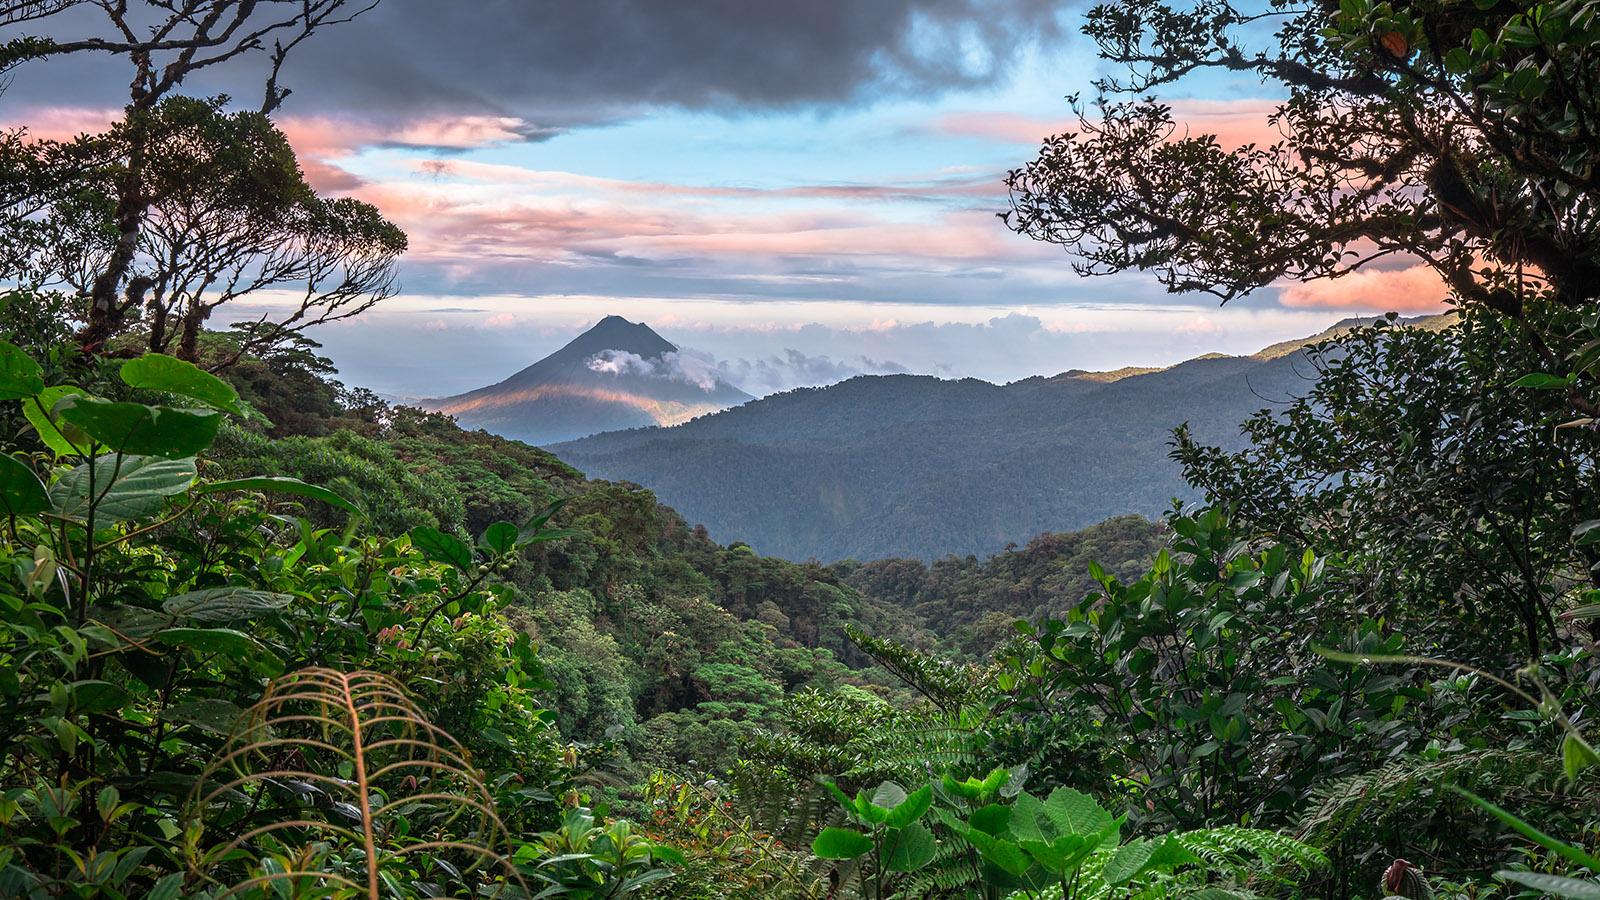 Breathtaking view of the Cordillera de Tilarán mountain range taken from the district of Monte Verde in Puntarenas.